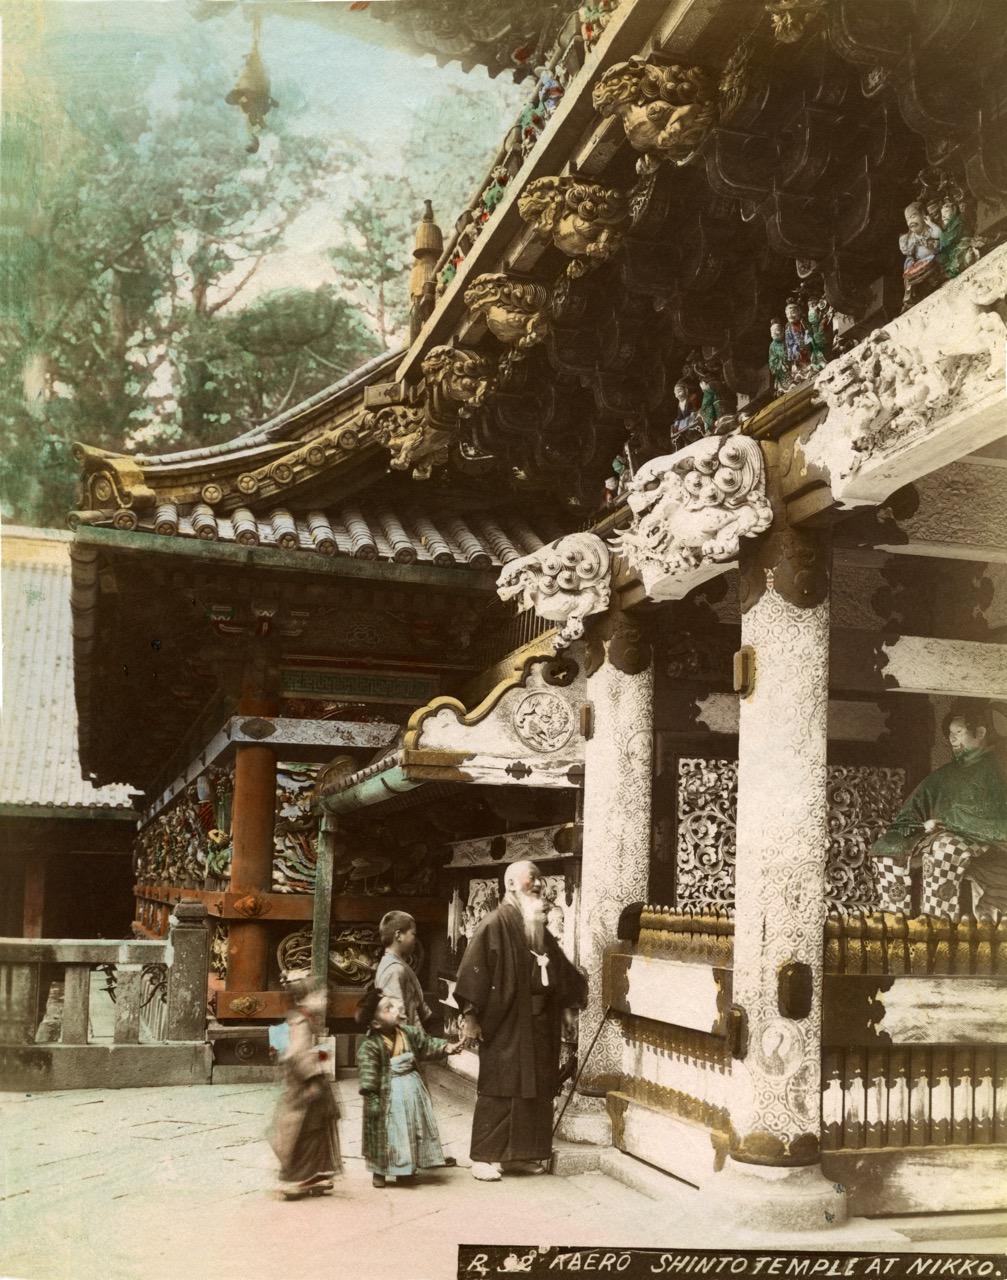 Никко. Синтоистский храм Каэру